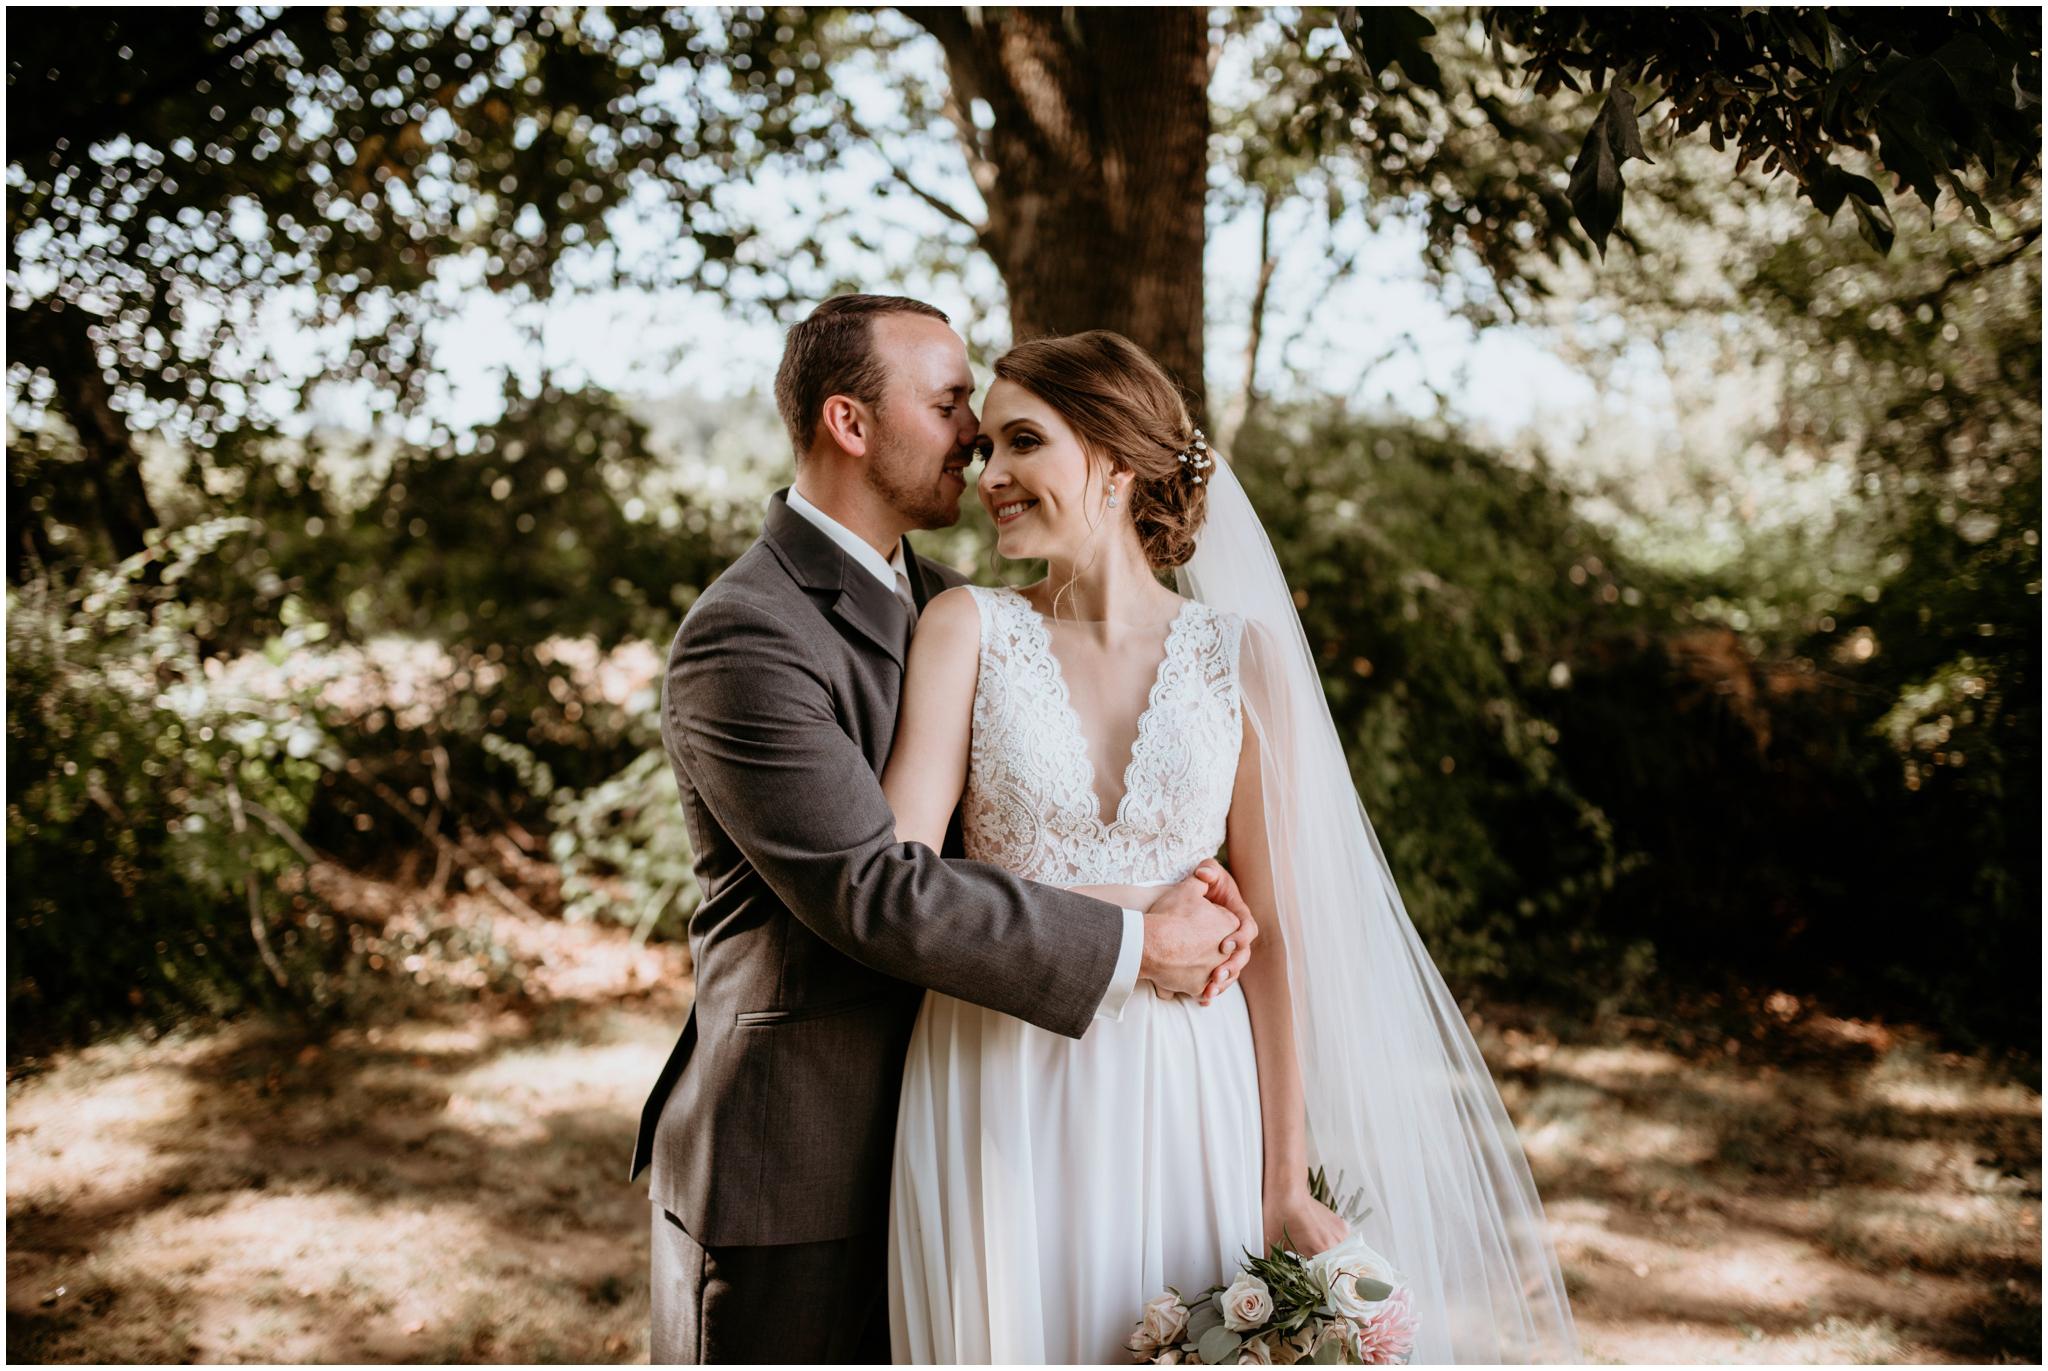 erin-and-tyler-evergreen-gardens-bellingham-wedding-photographer-079.jpg